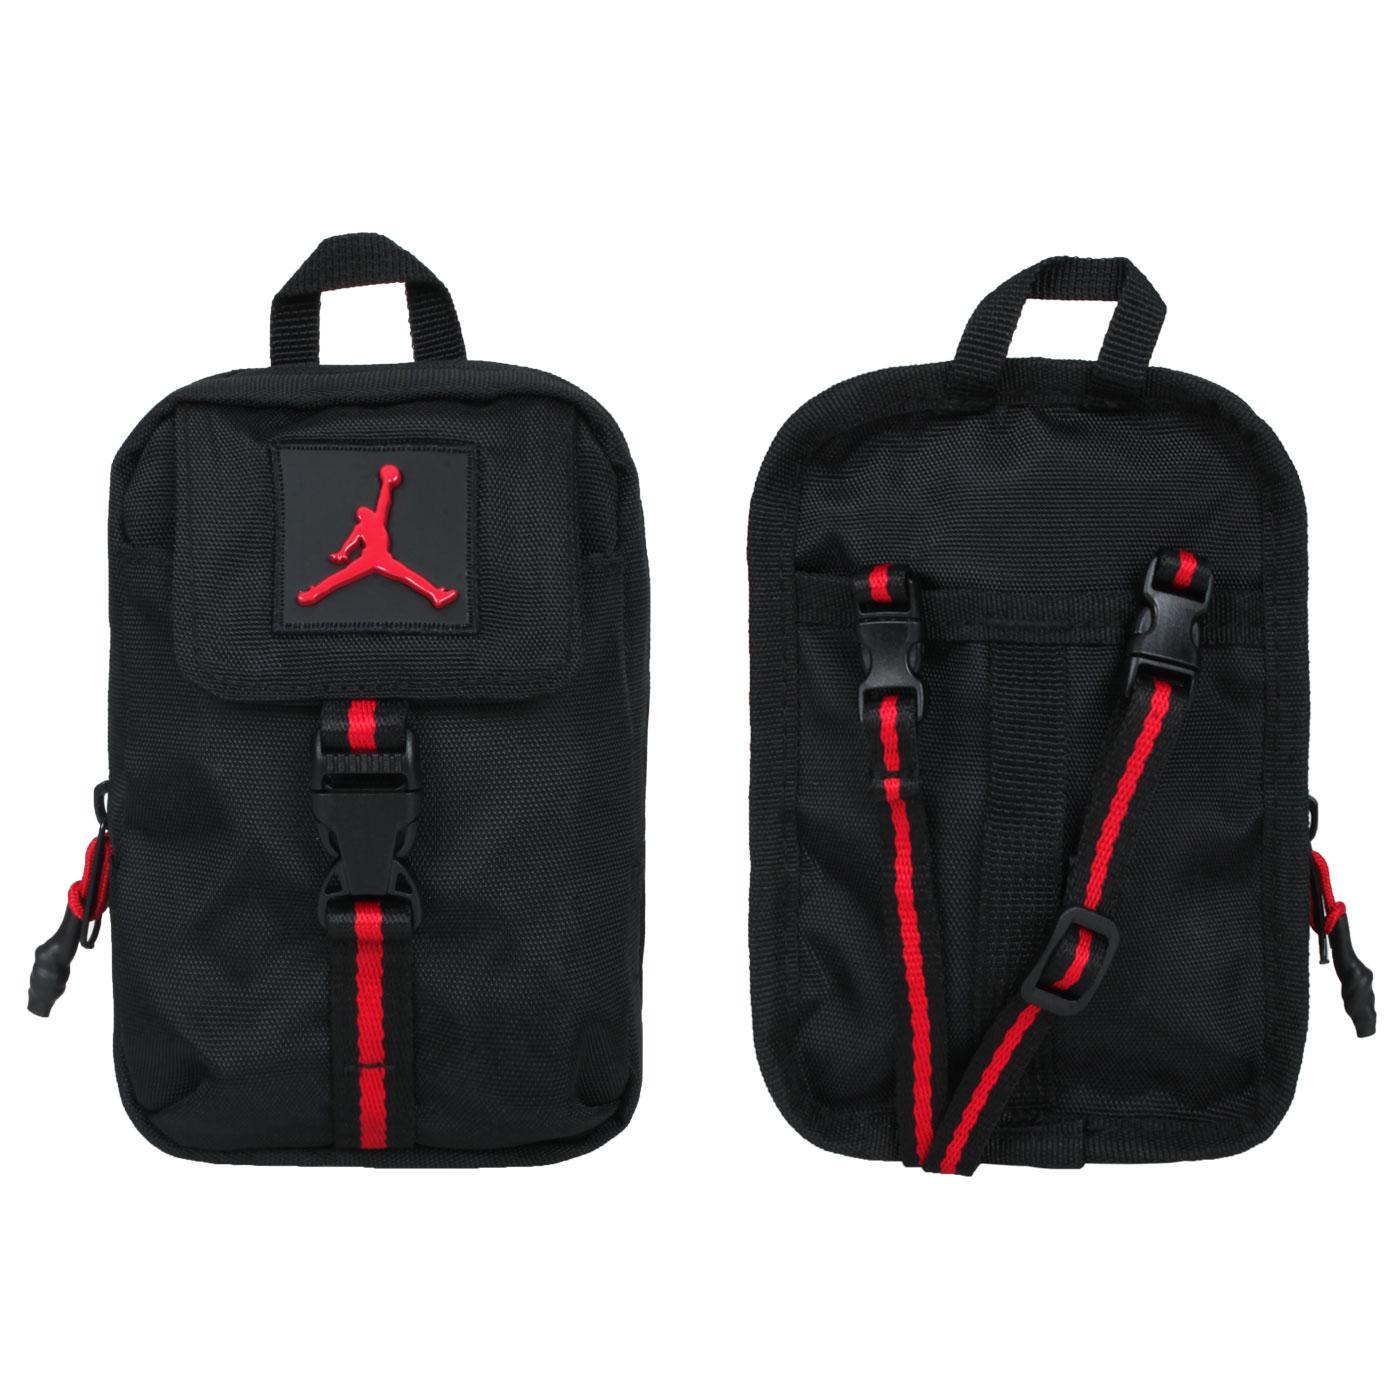 NIKE 小型卡包 JD2133028GS-001 - 黑紅